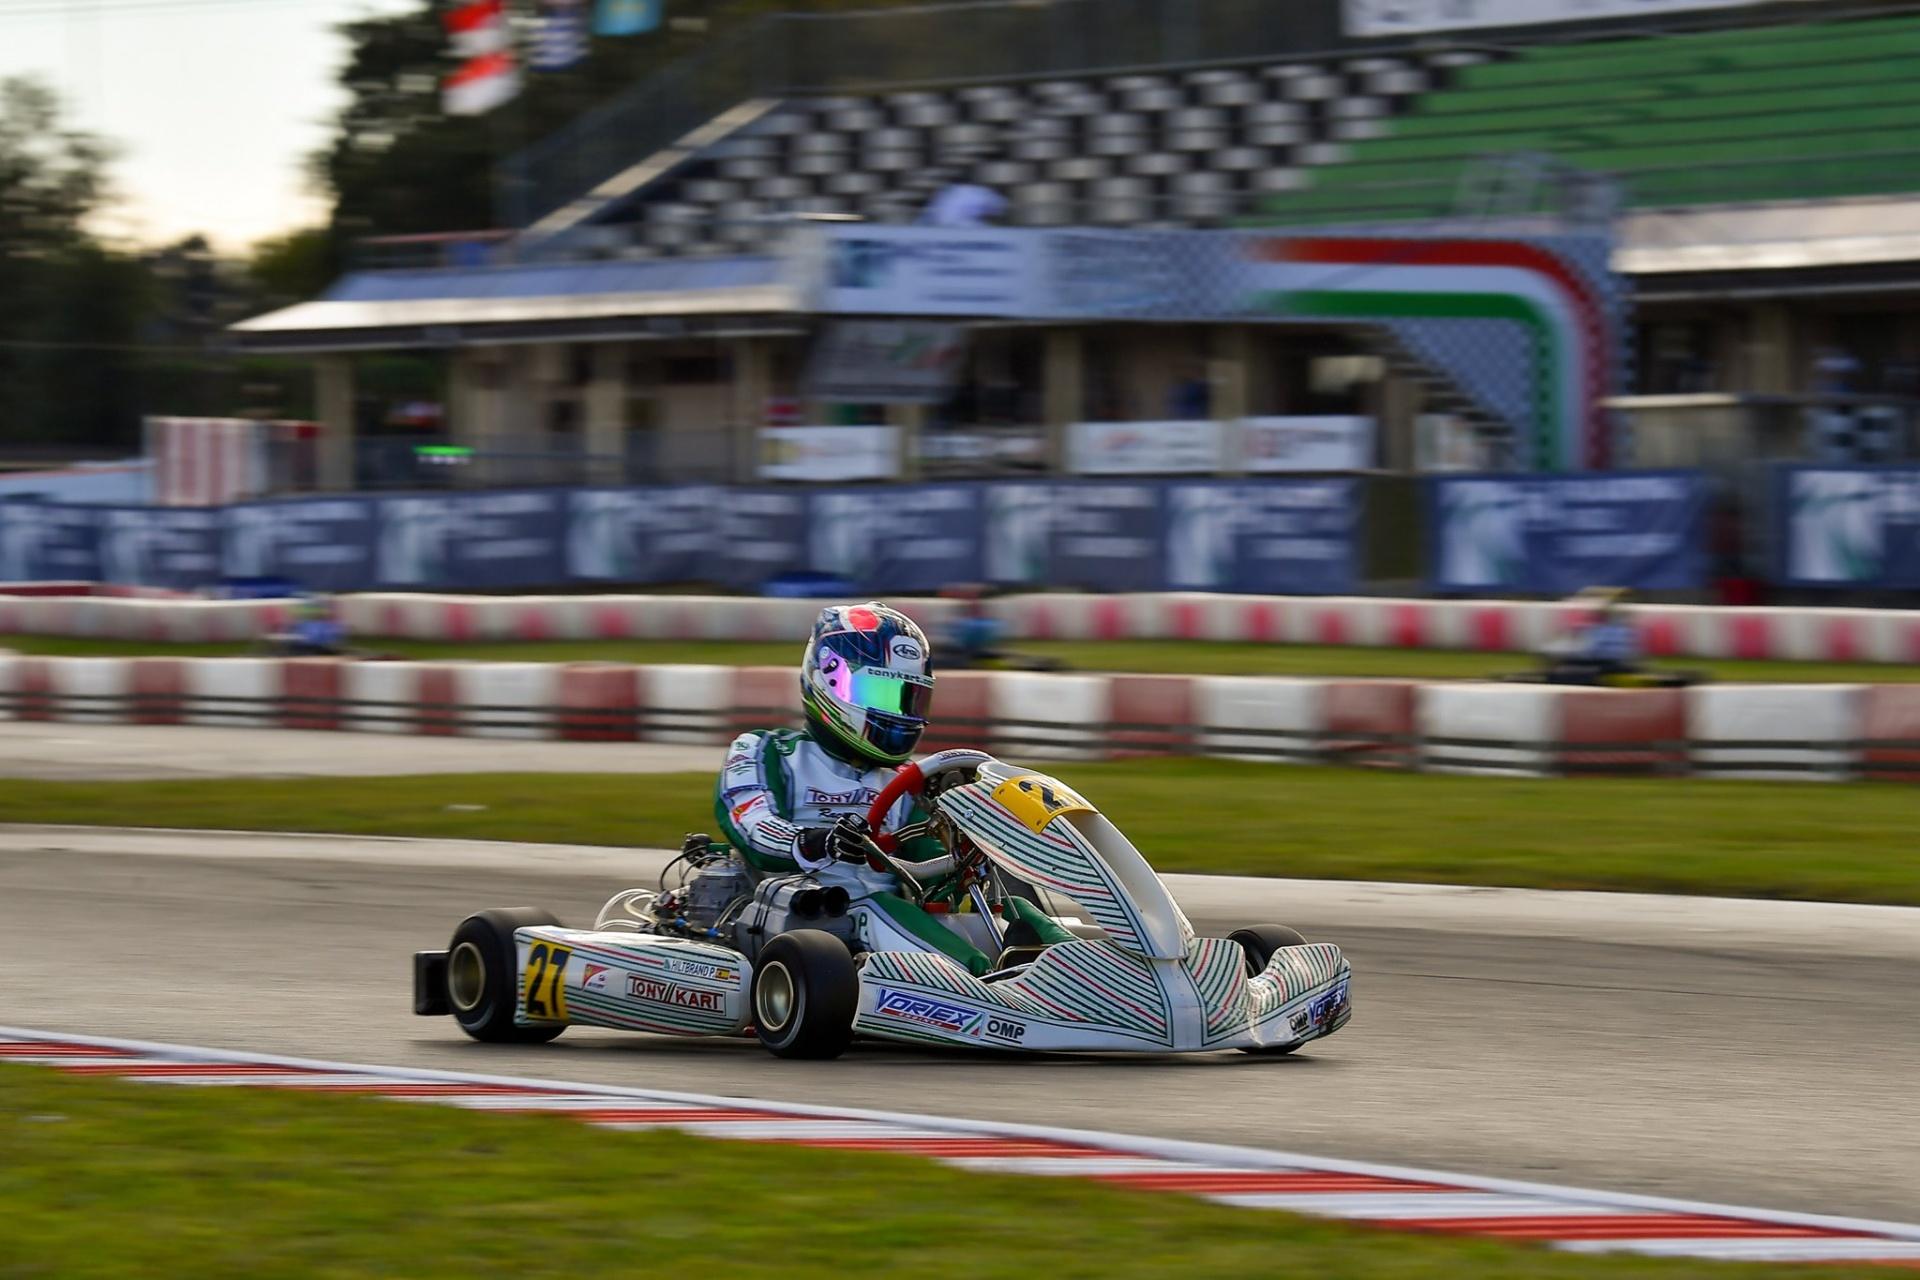 Mundial Karting FIA Lonato: Pedro Hiltbrand is Back!